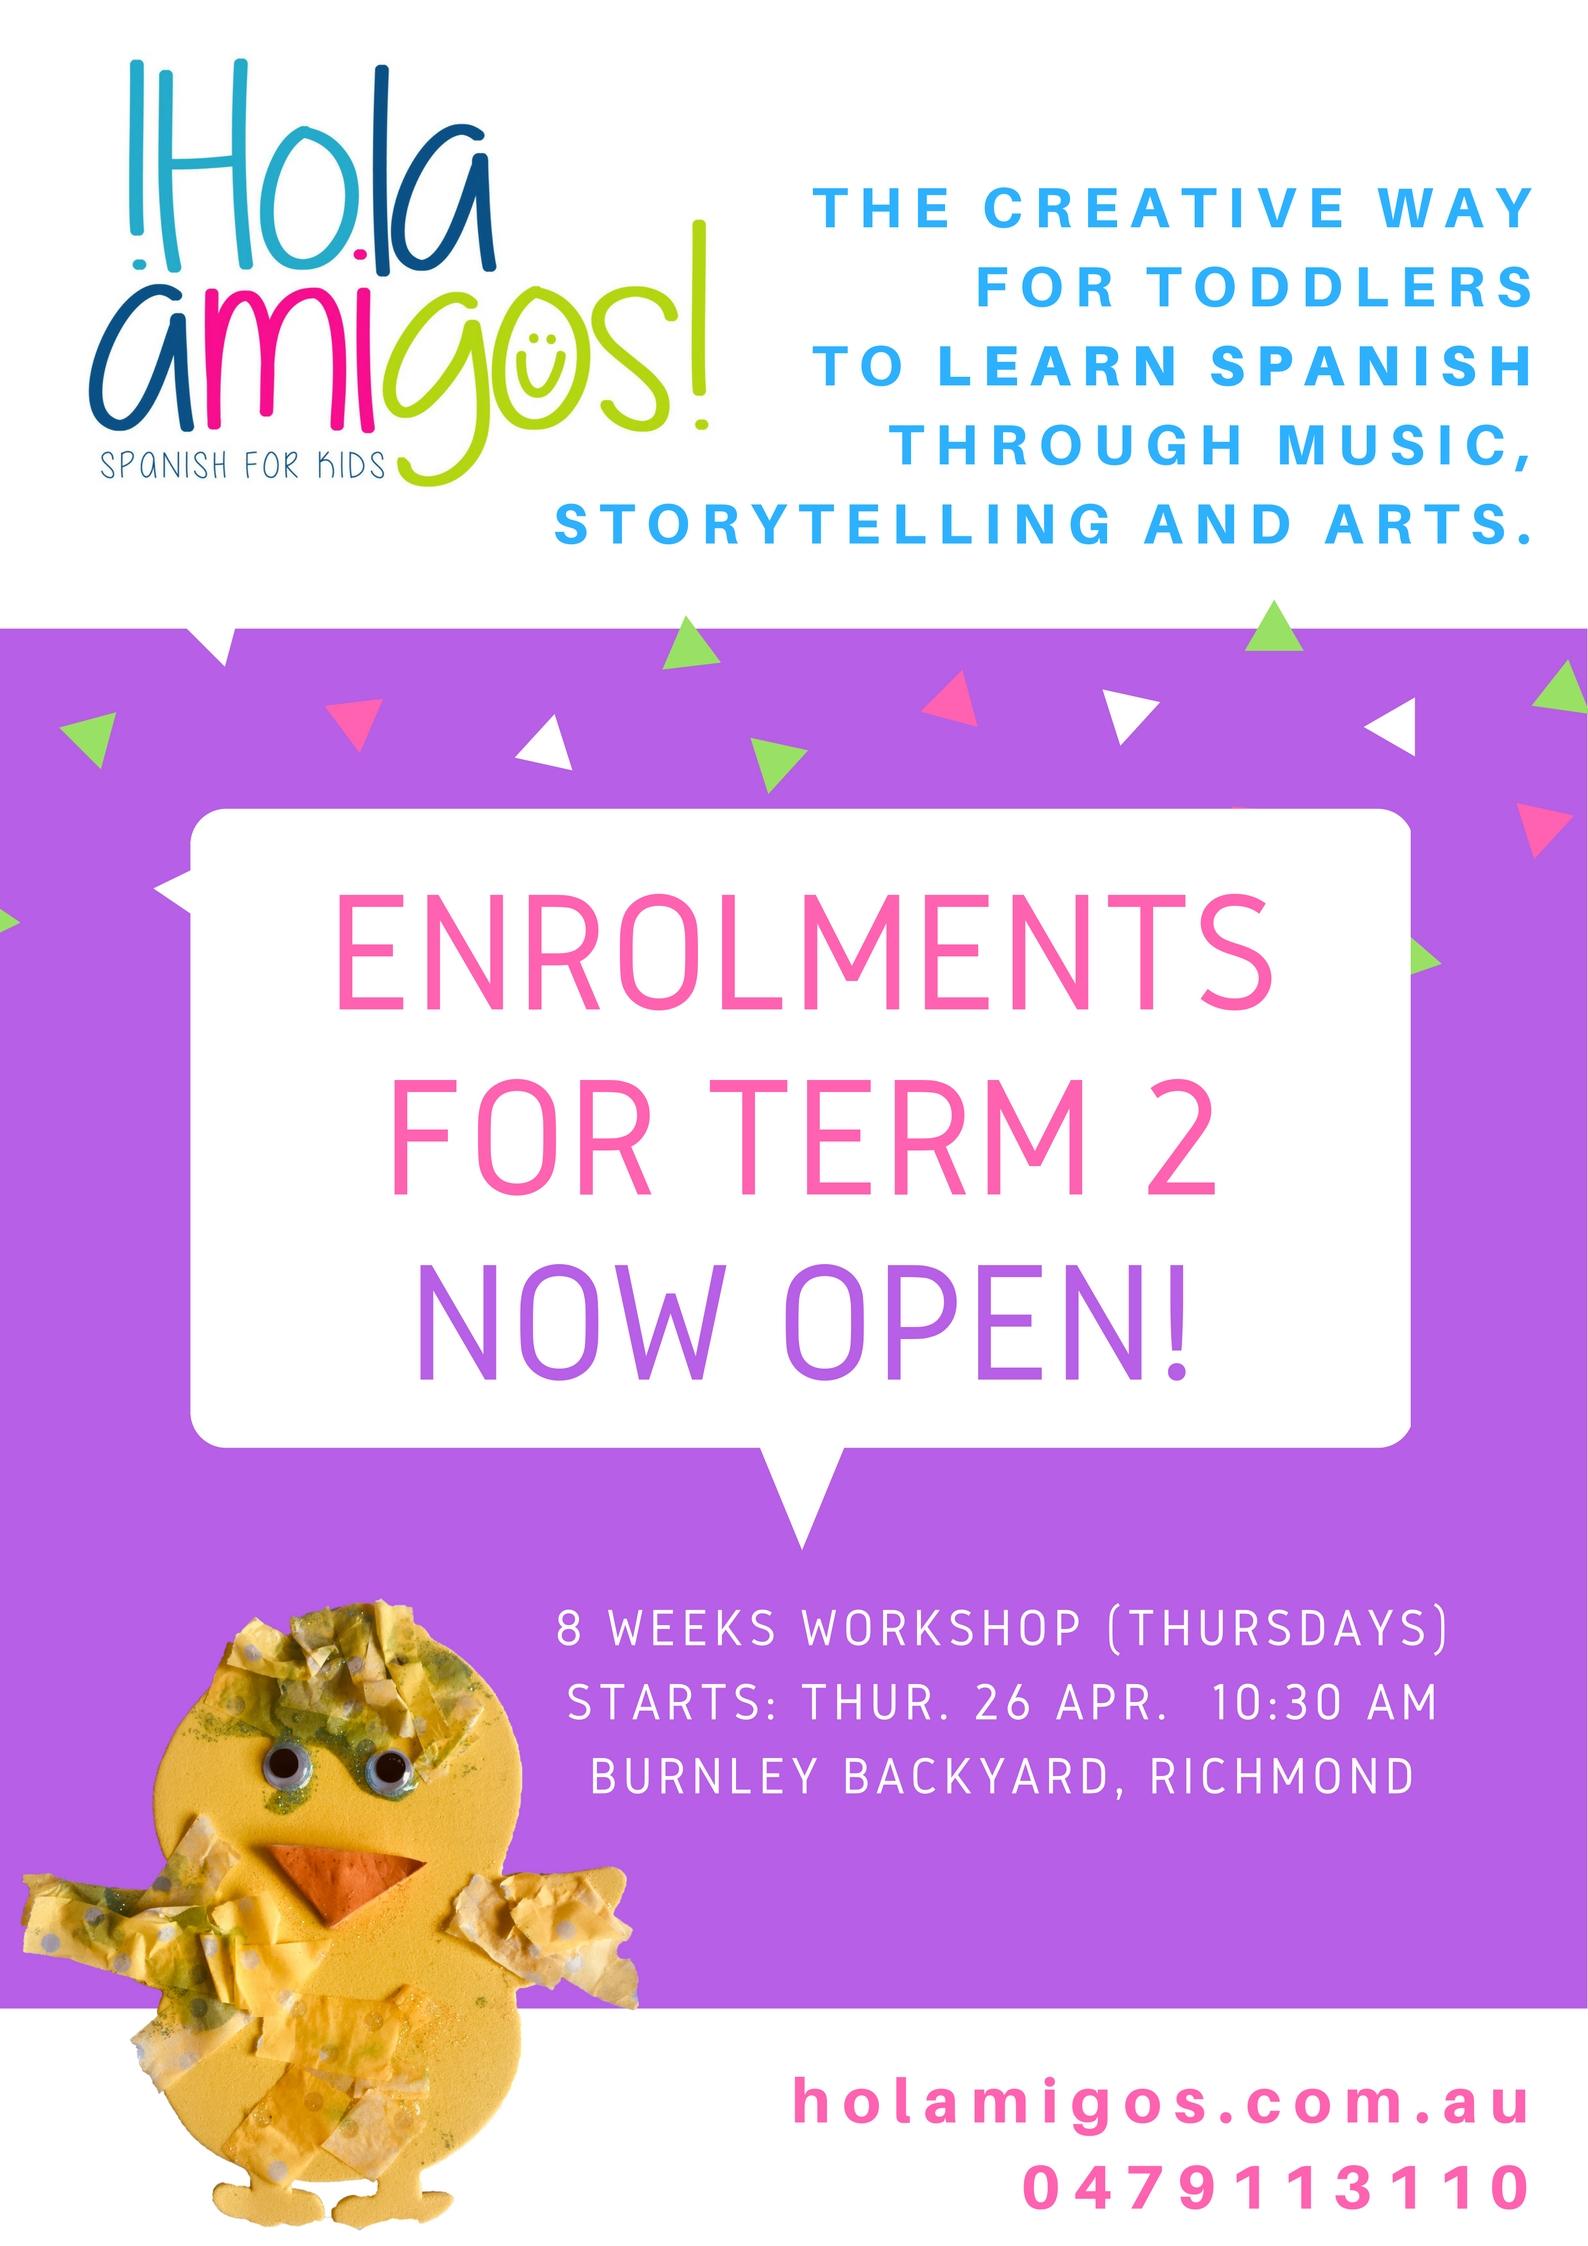 Richmond community learning centre holamigos spanish language spanish language class for kids m4hsunfo